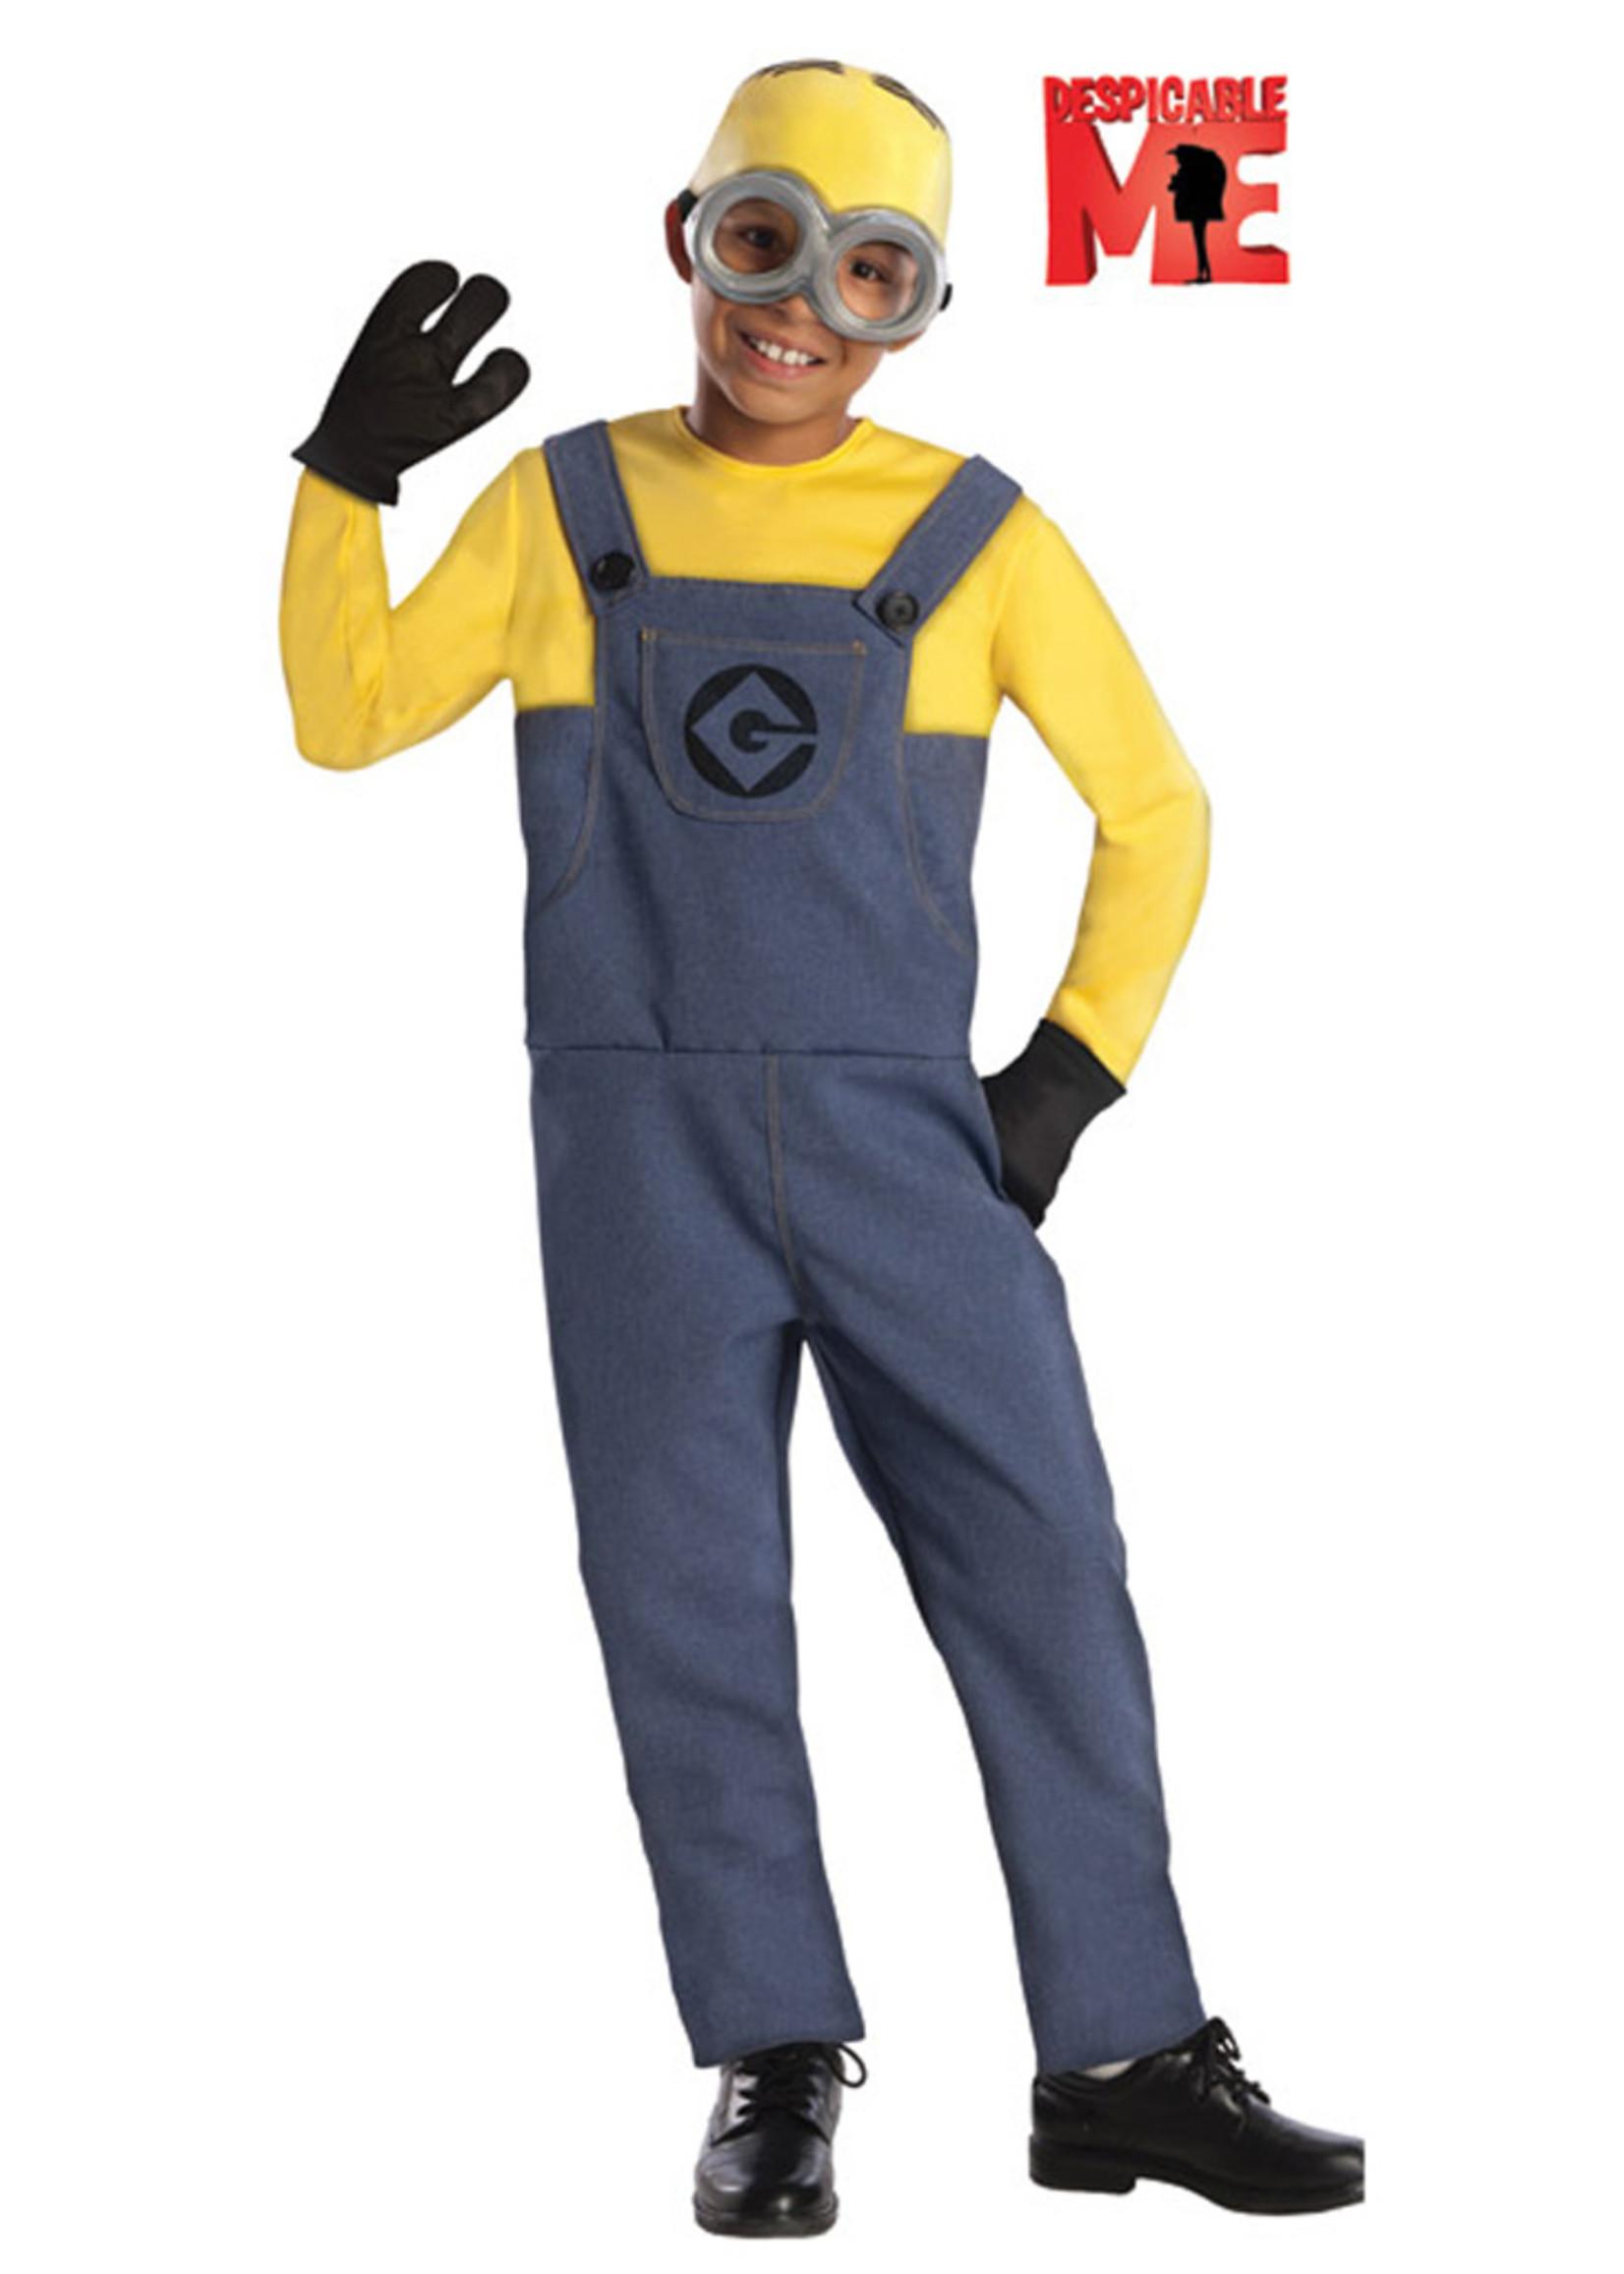 Minion Dave Costume - Boys